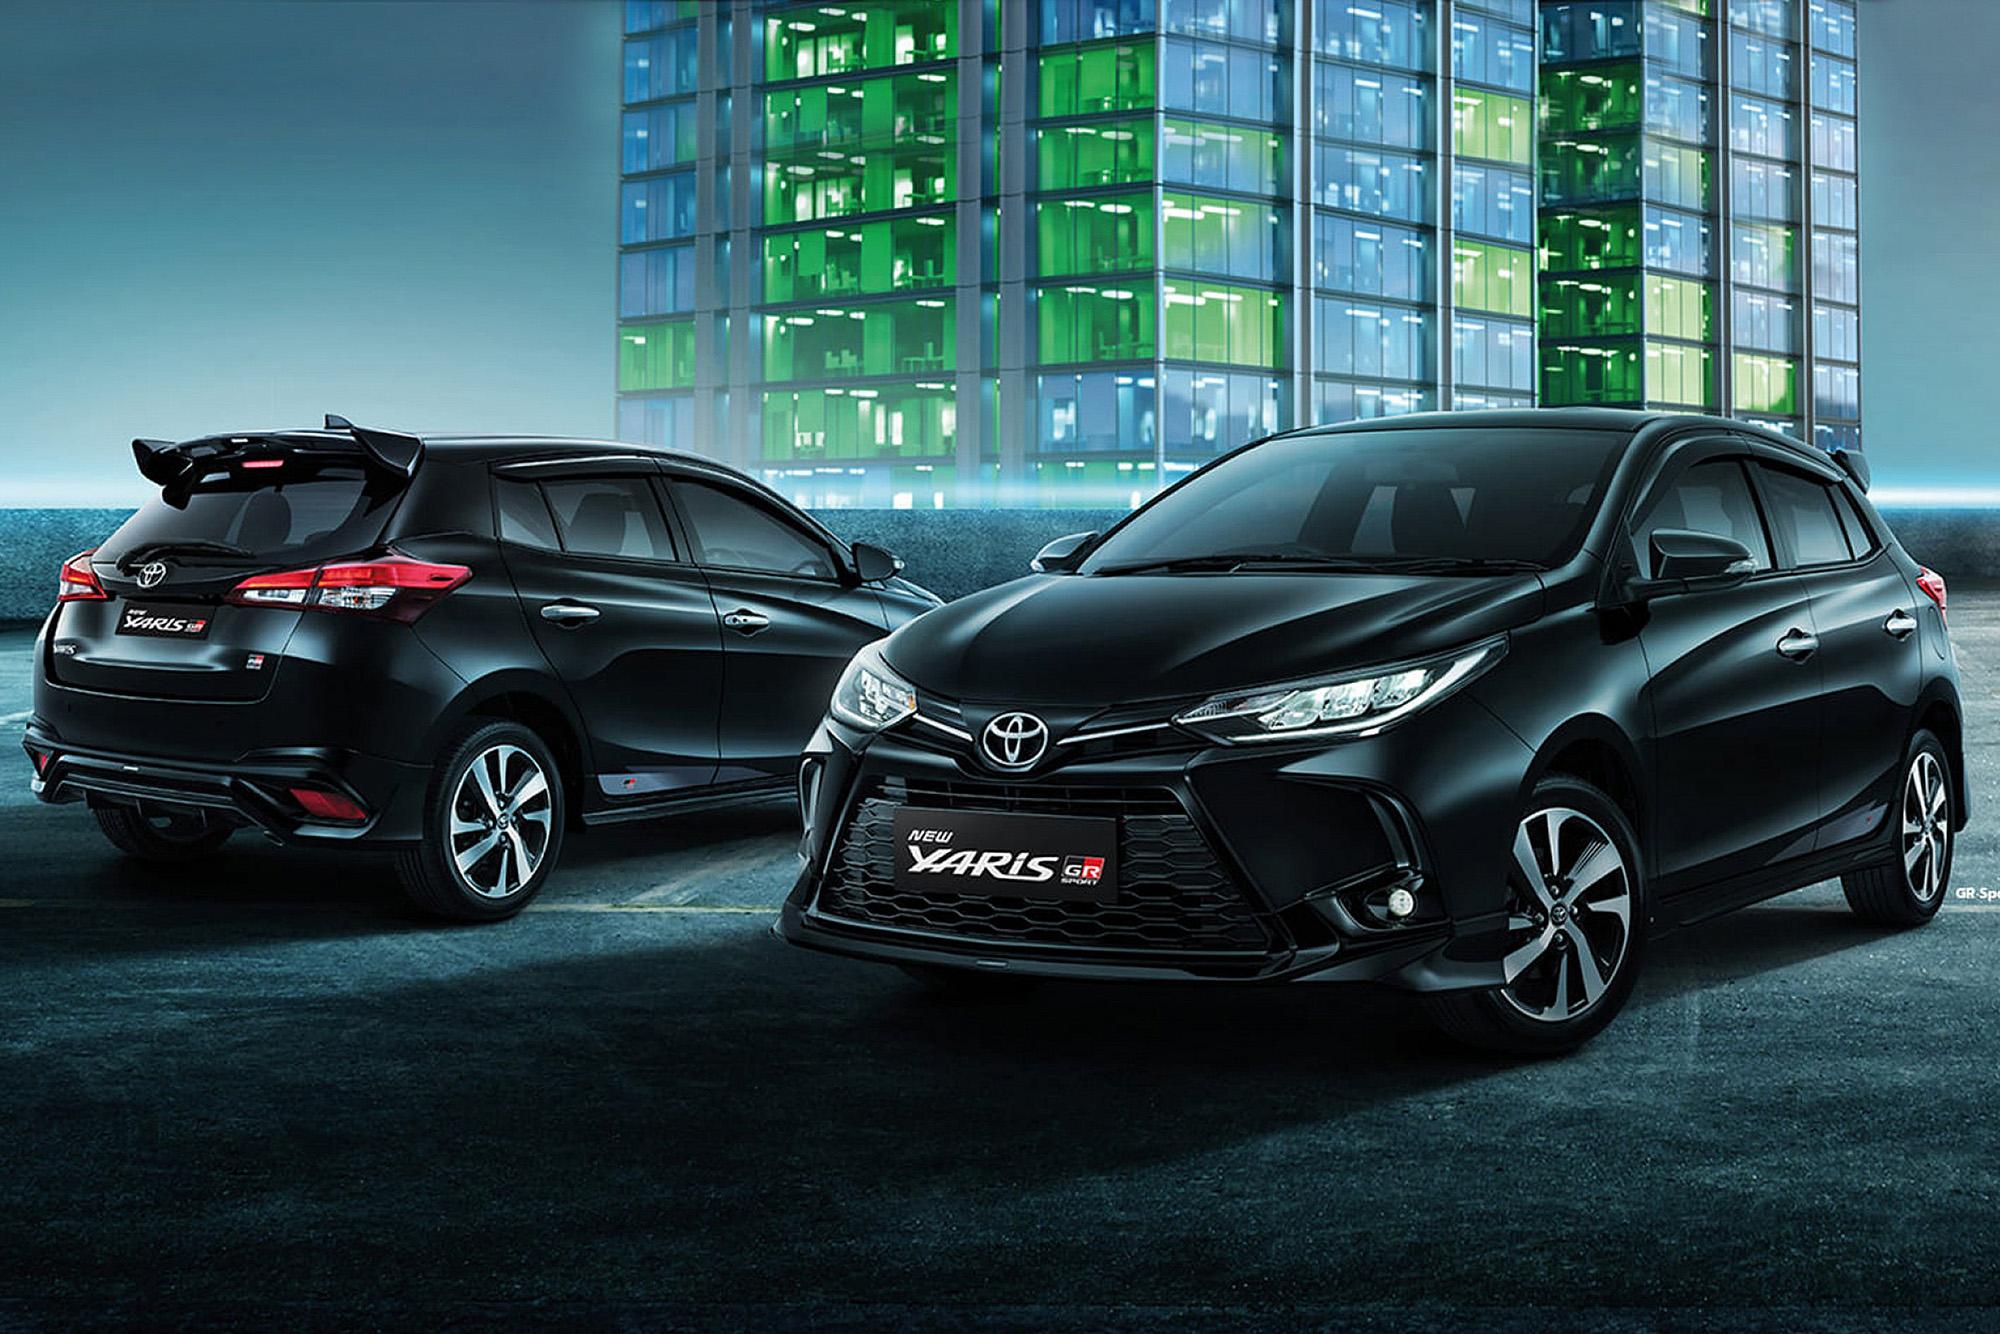 Dois Toyota Yaris GR Sport pretos